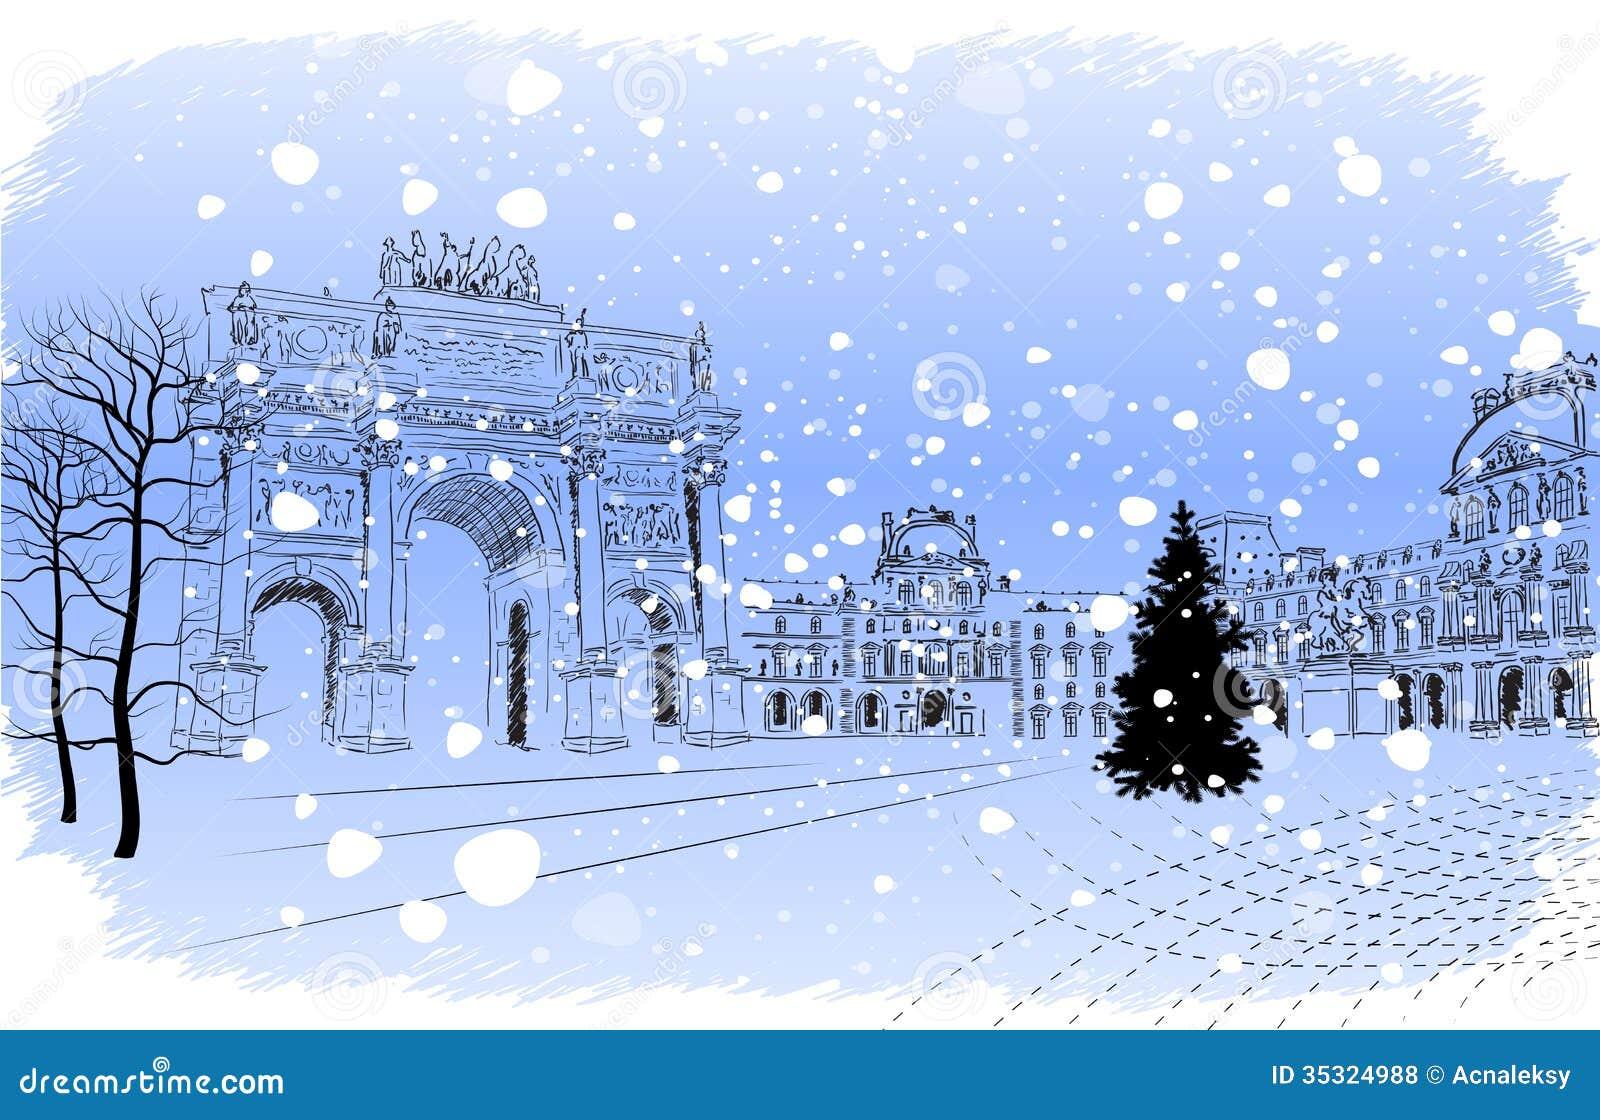 Winter Music Clipart